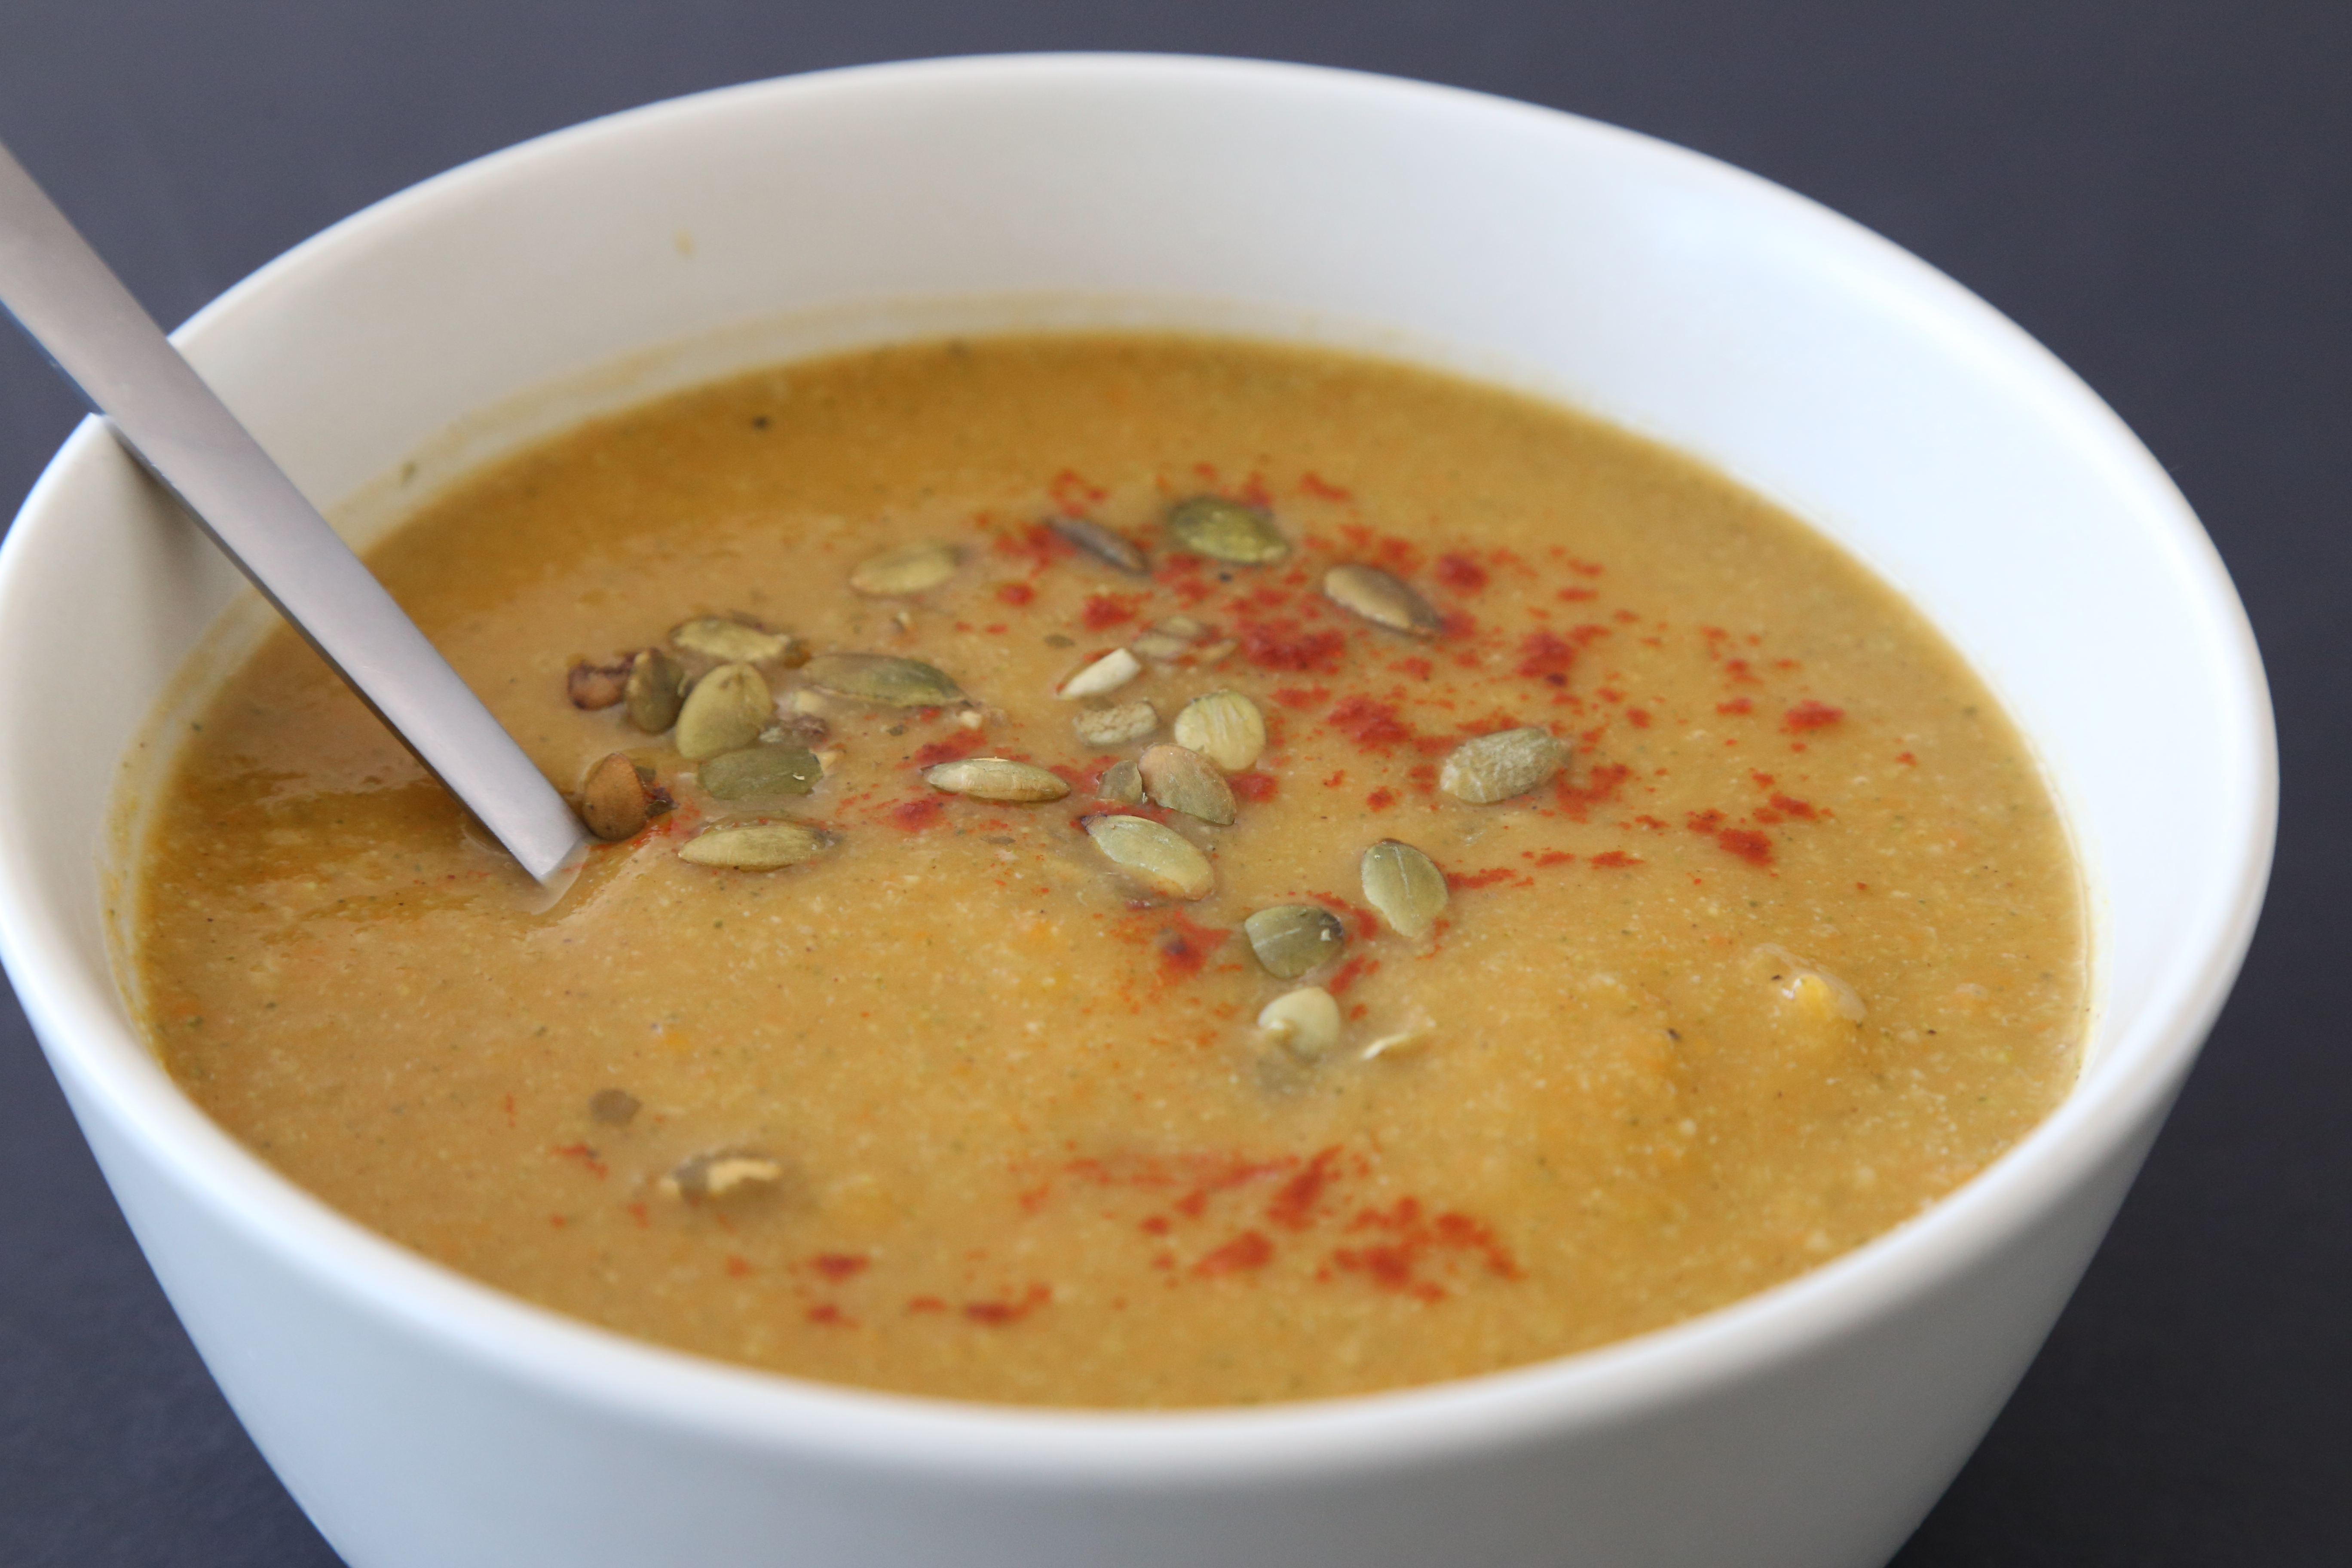 Meg's Food! | Creamy Seven Vegetable Soup - Meg's Food!